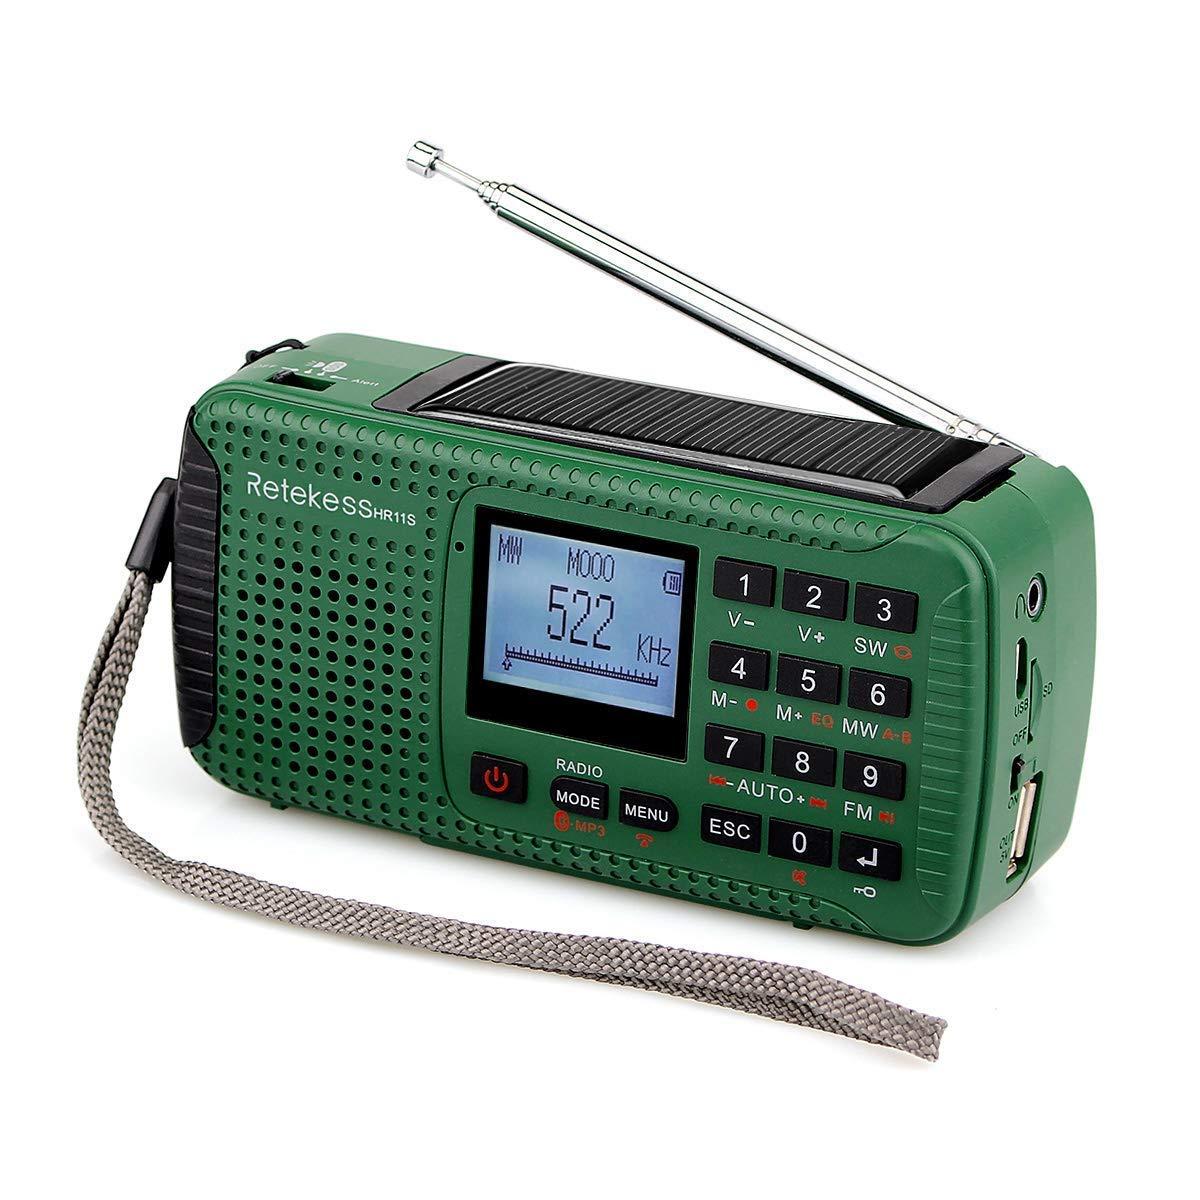 Retekess HR11S Portable Emergency Radio Crank AM FM Radio Shortwave with MP3 Player Digital Recorder Red SOS Power Bank Wind Up Camping Radio(Green)